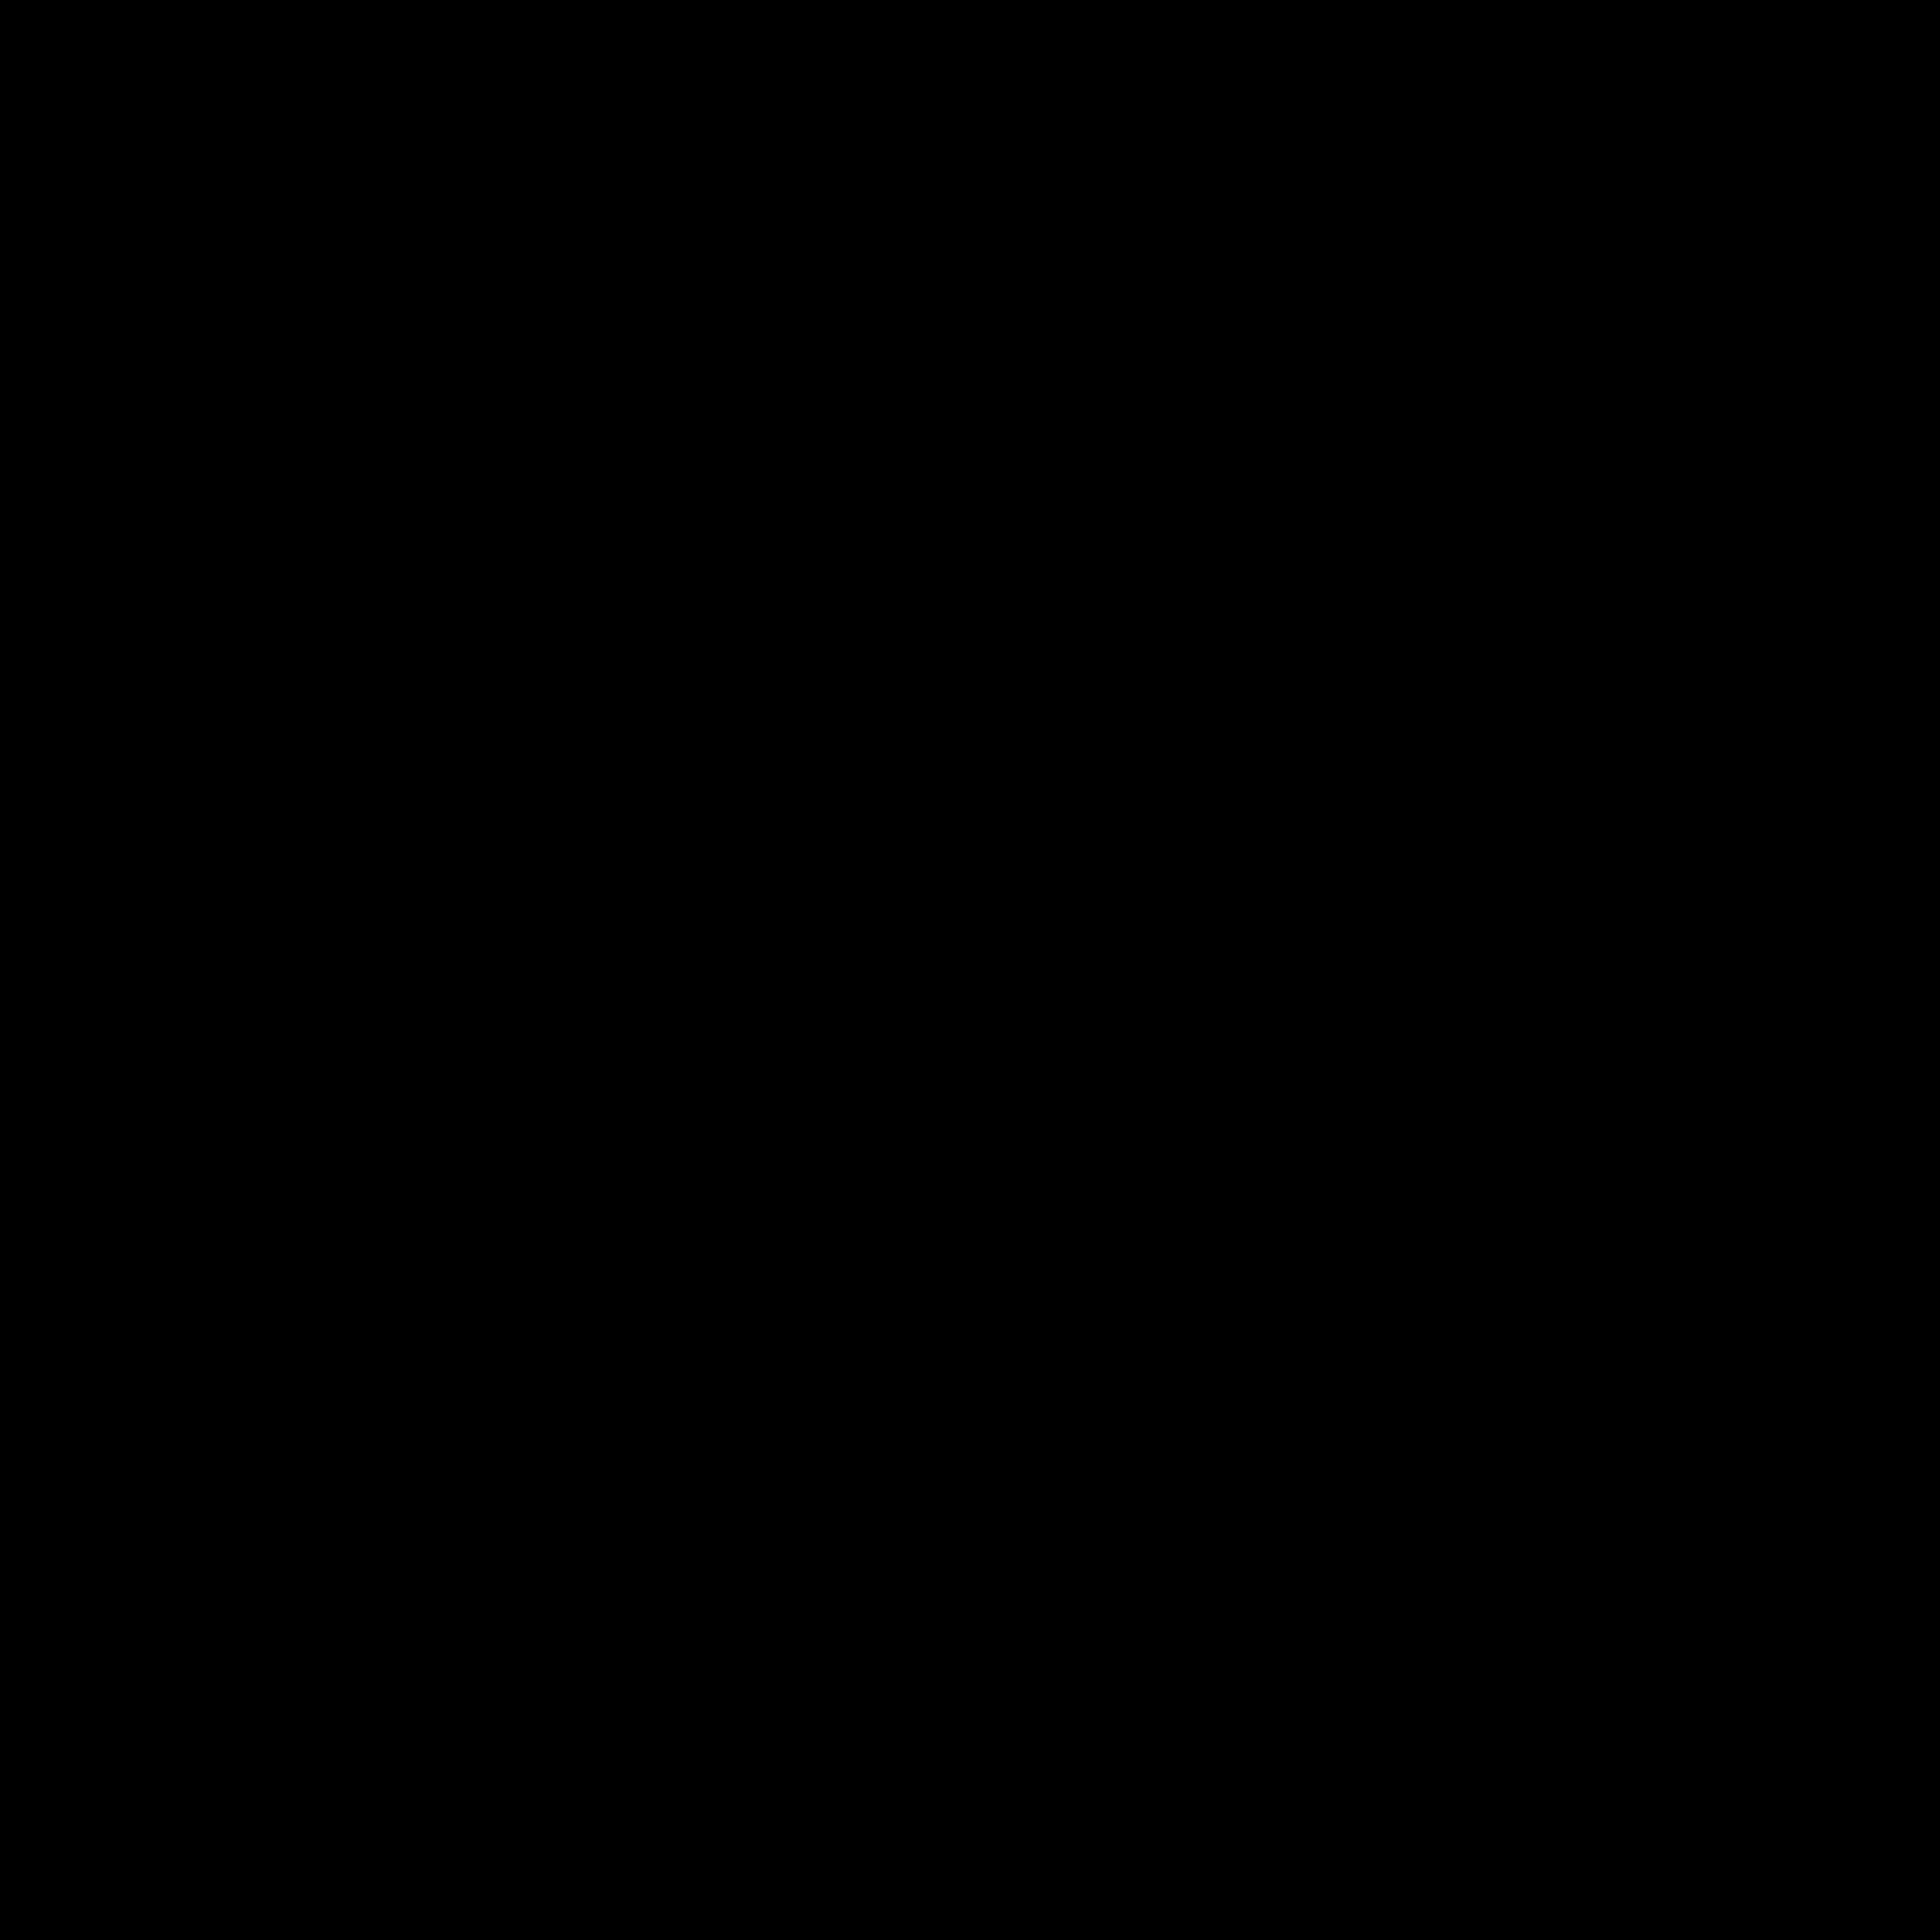 Disneyland Logo PNG Transparent & SVG Vector - Freebie Supply